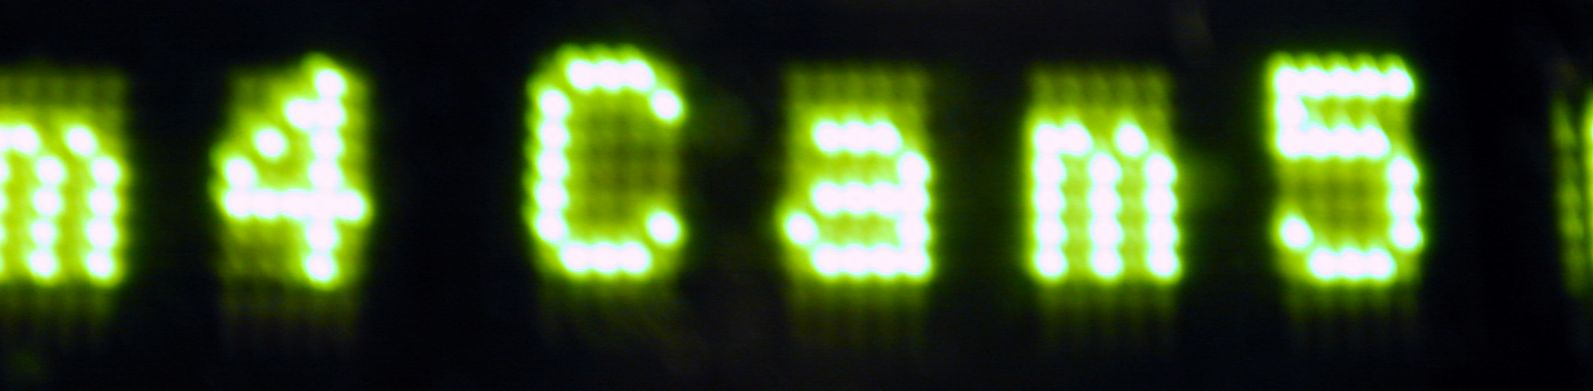 image.php?image=b1cam5.jpg&dl=1